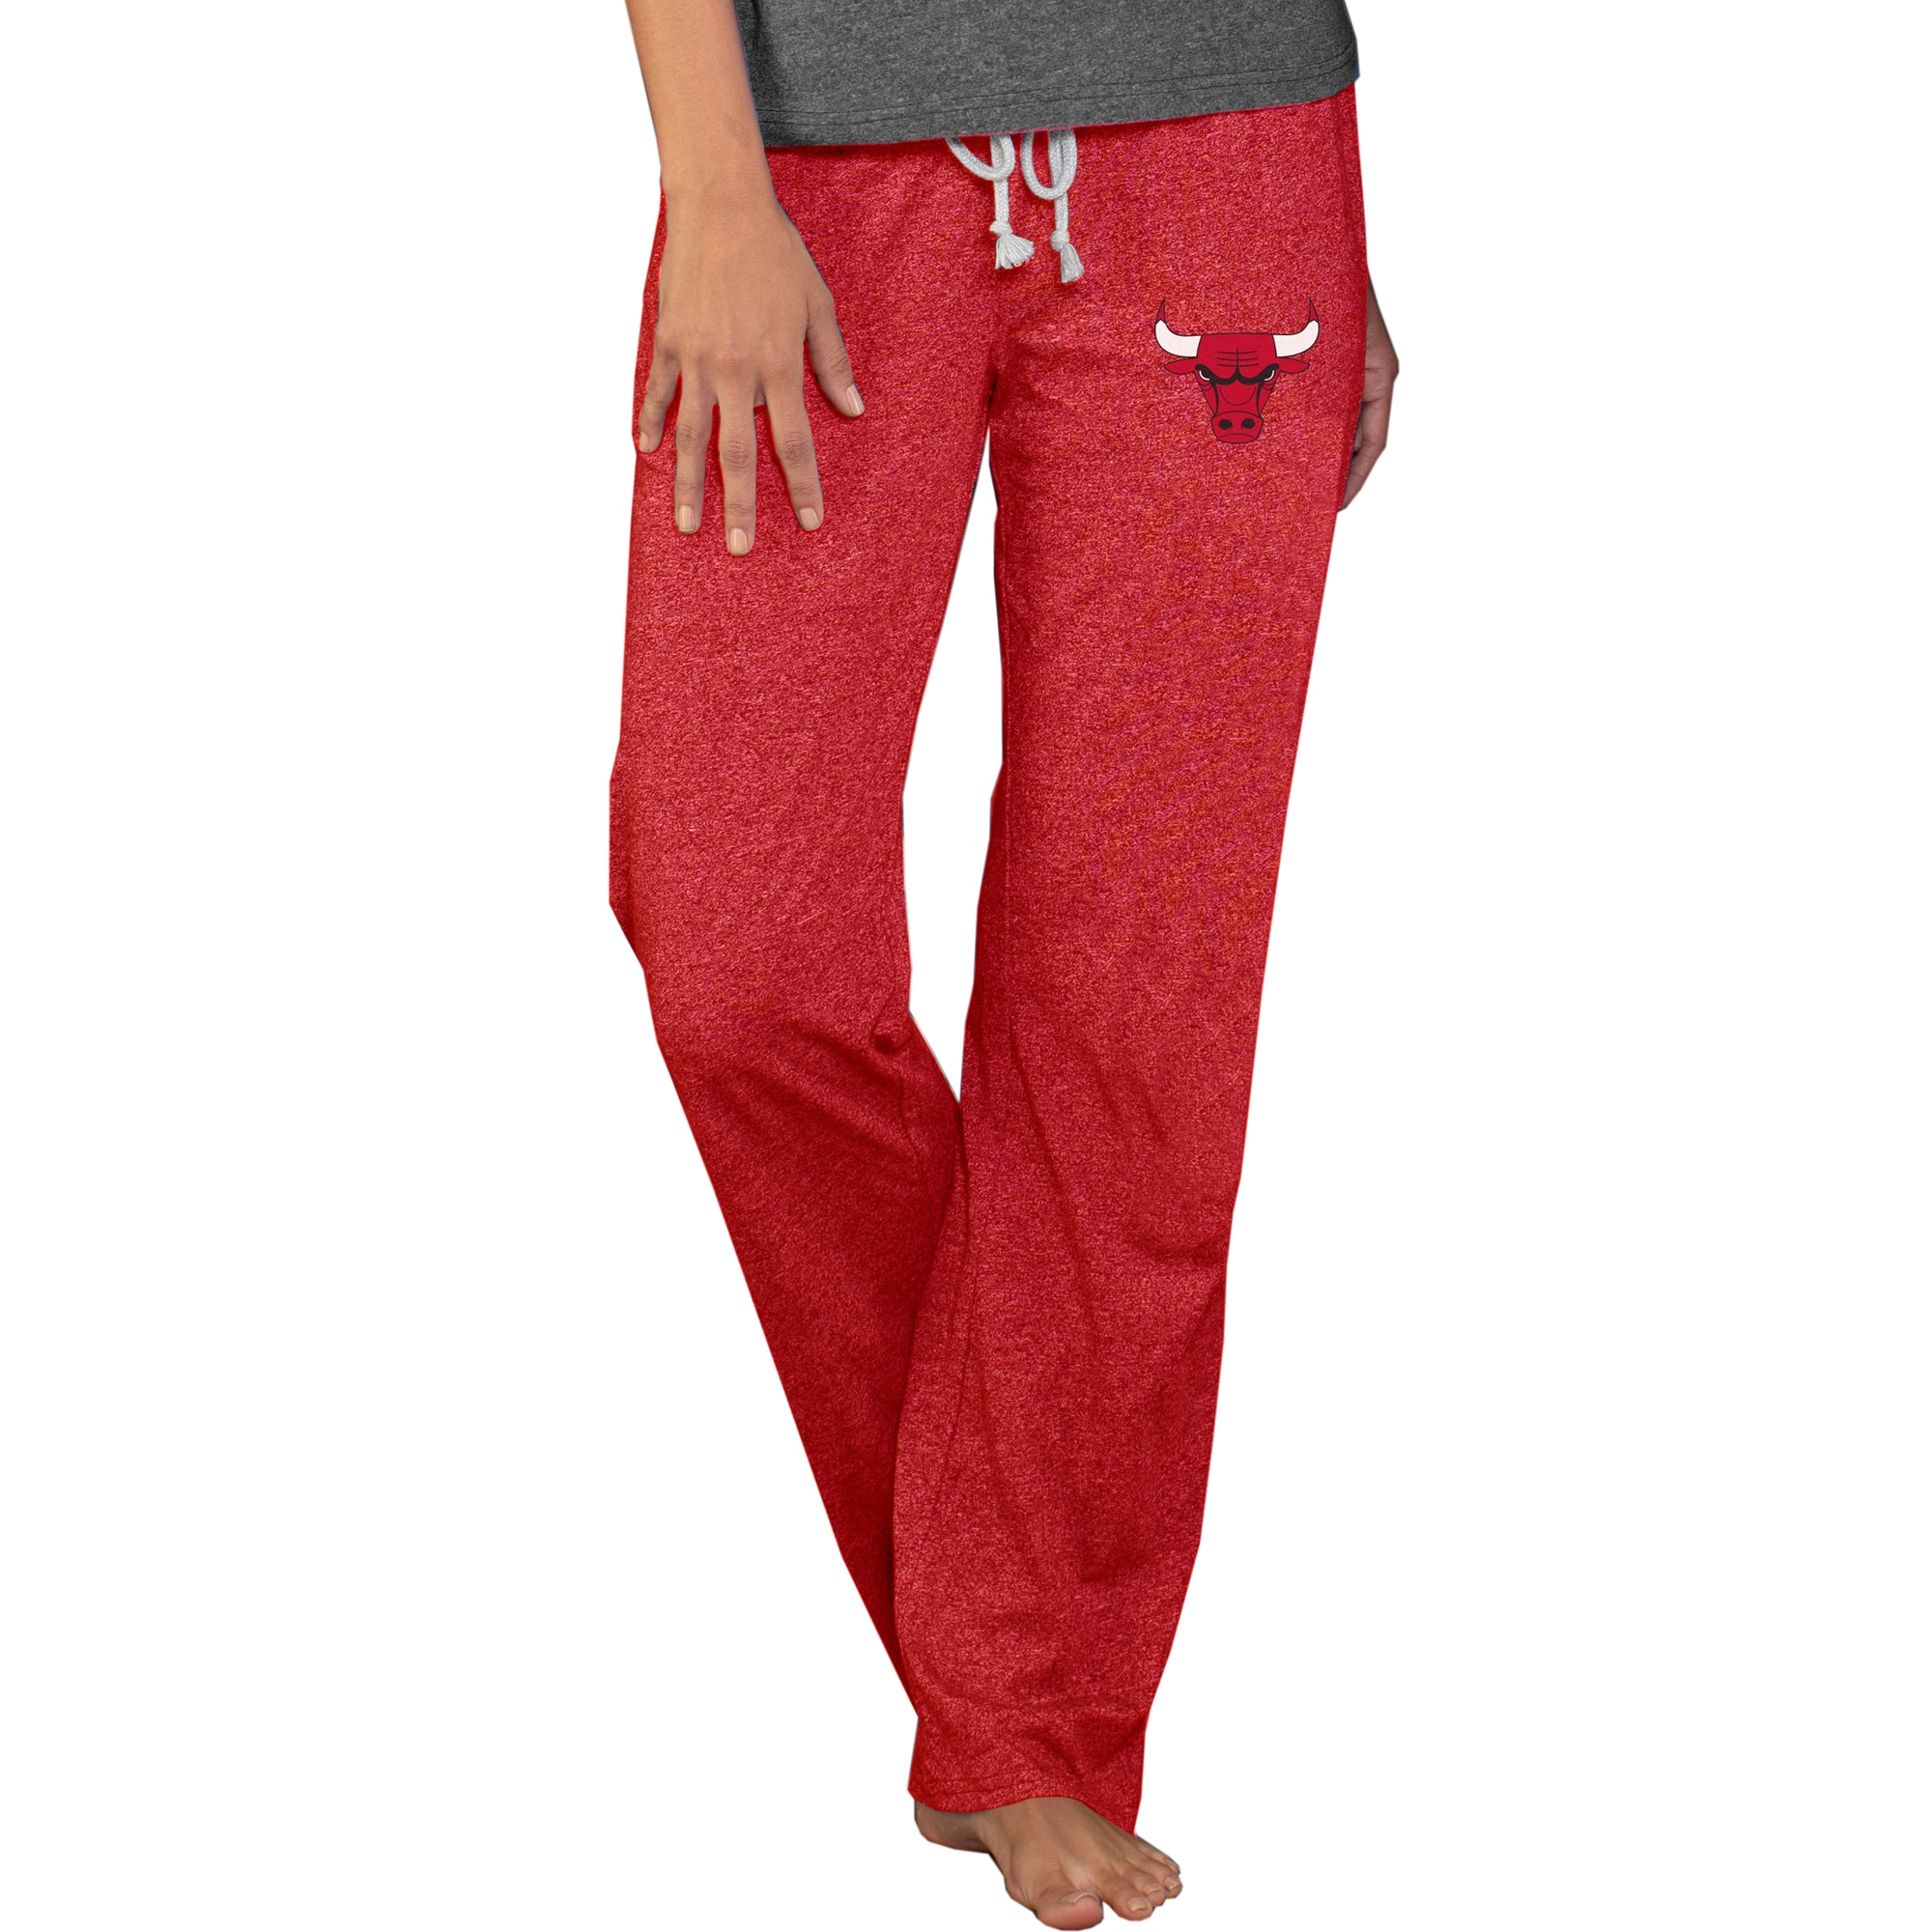 Chicago Bulls Concepts Sport Women's Quest Knit Pants - Red